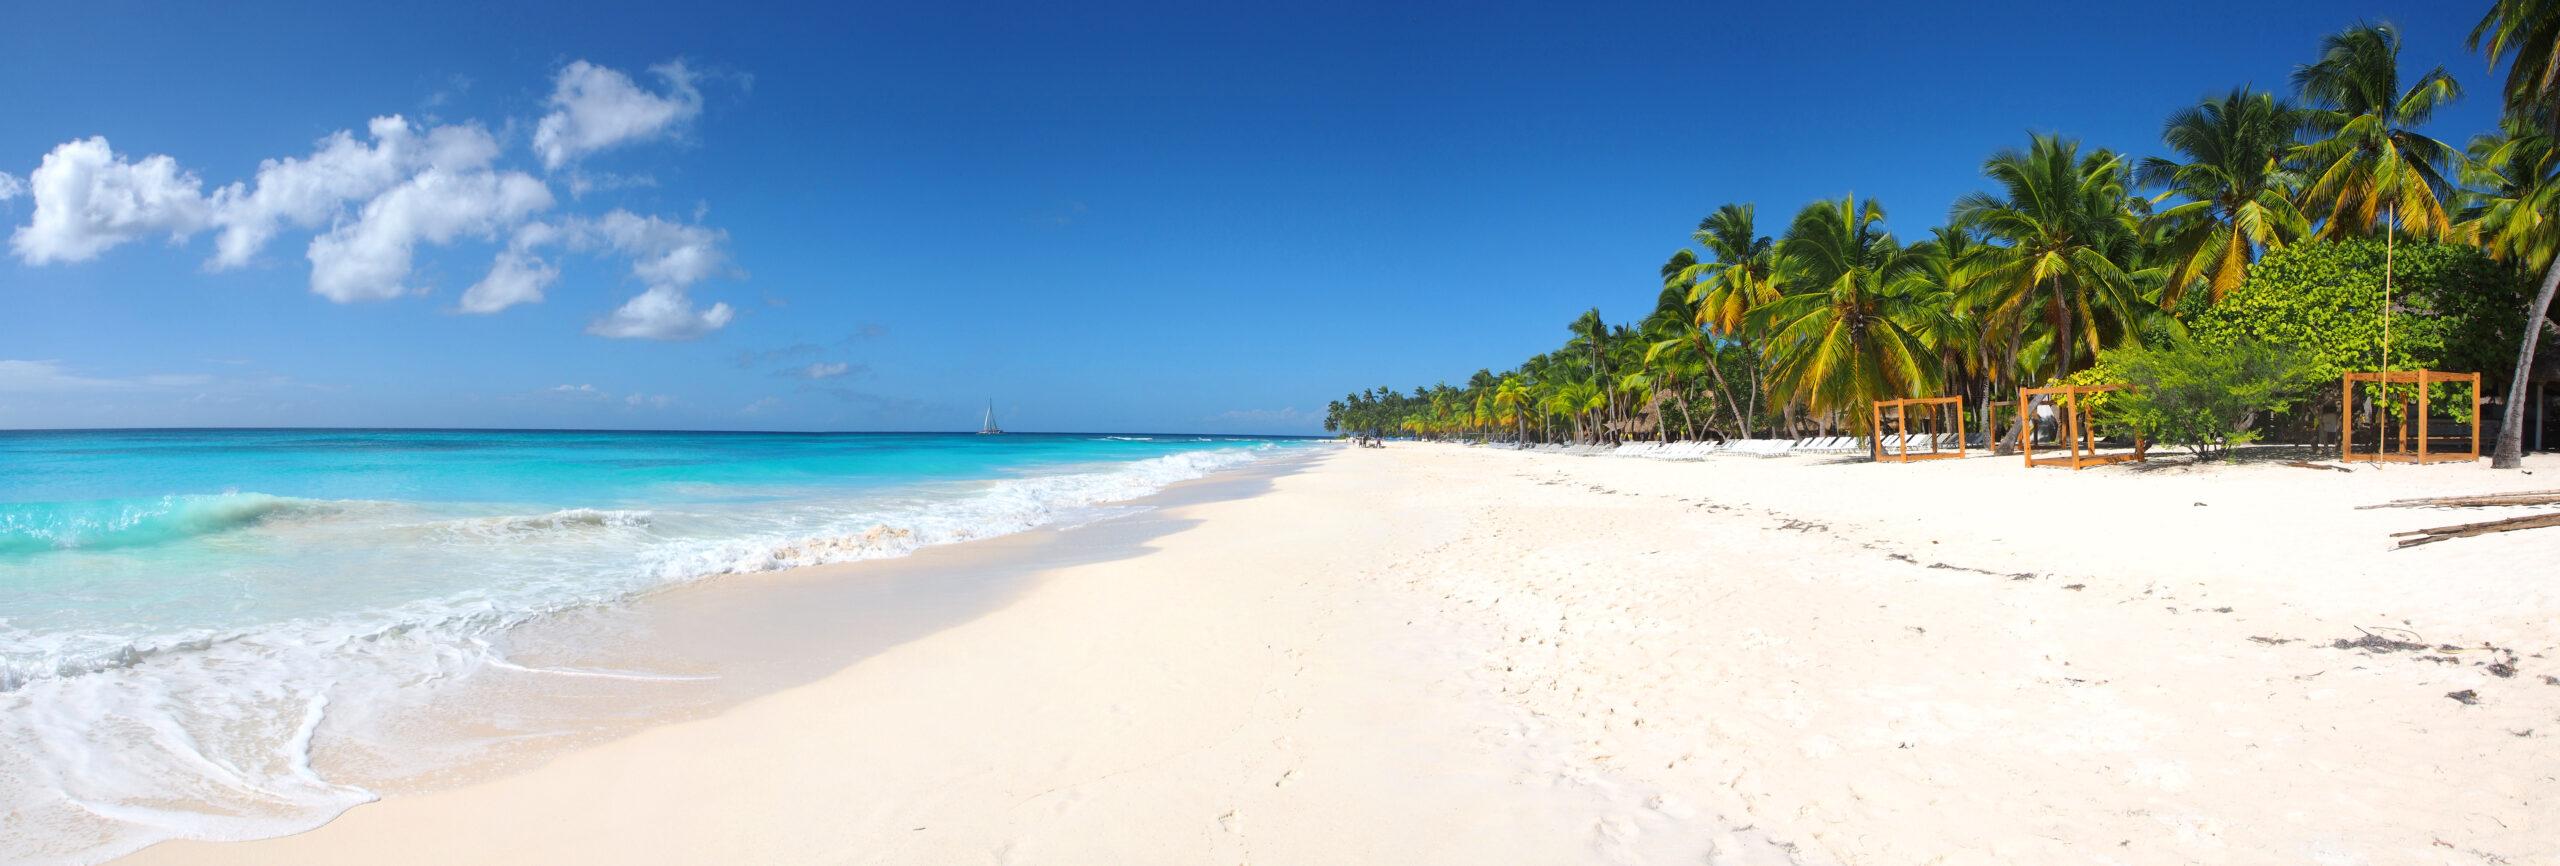 Carribean Island